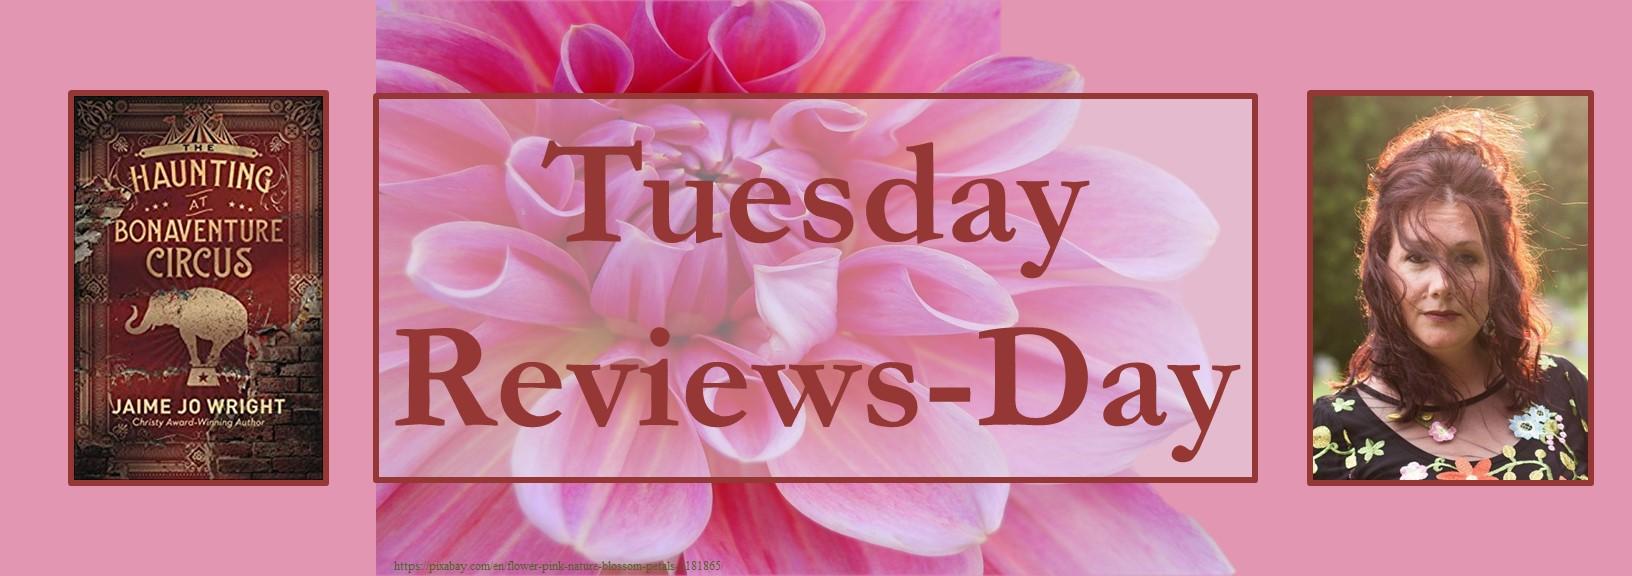 091220 - bonaventure circus - tuesday reviews day banner